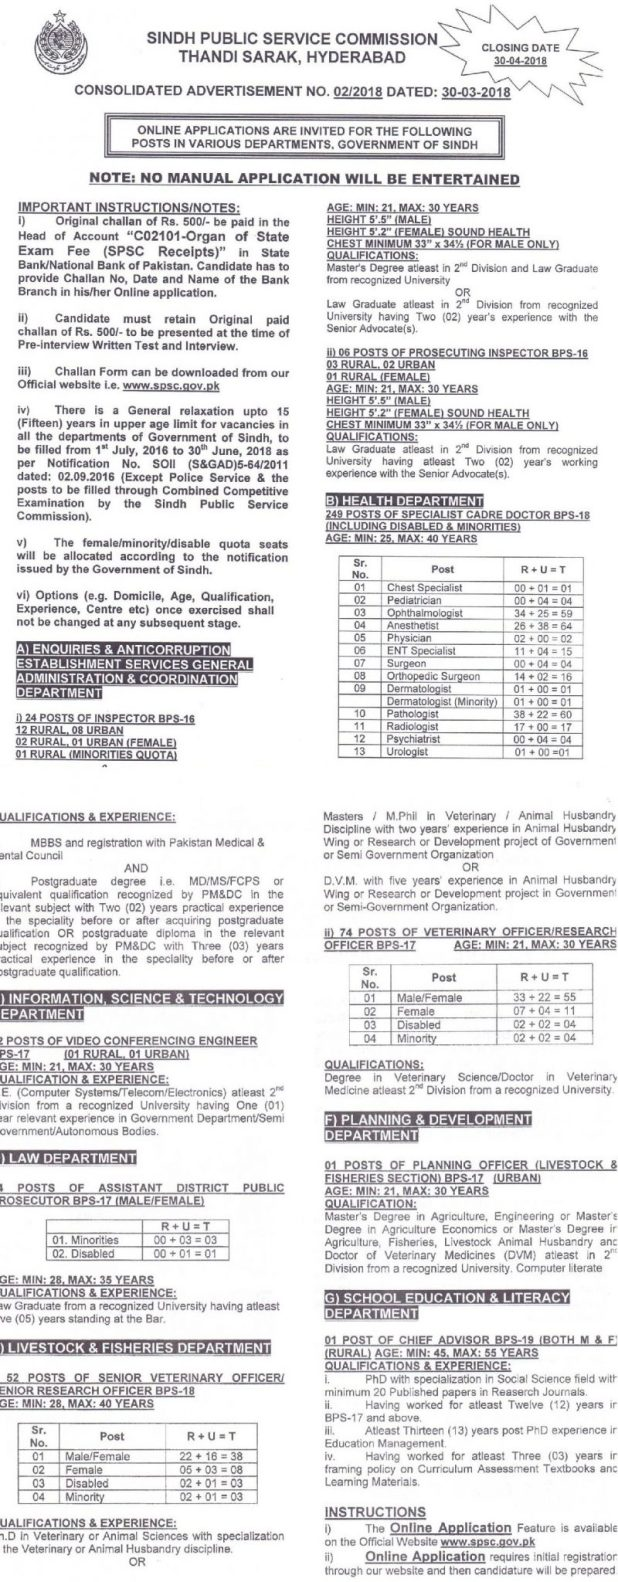 SPSC Sindh Public Service Commission Health Department Jobs 2018 Online Apply